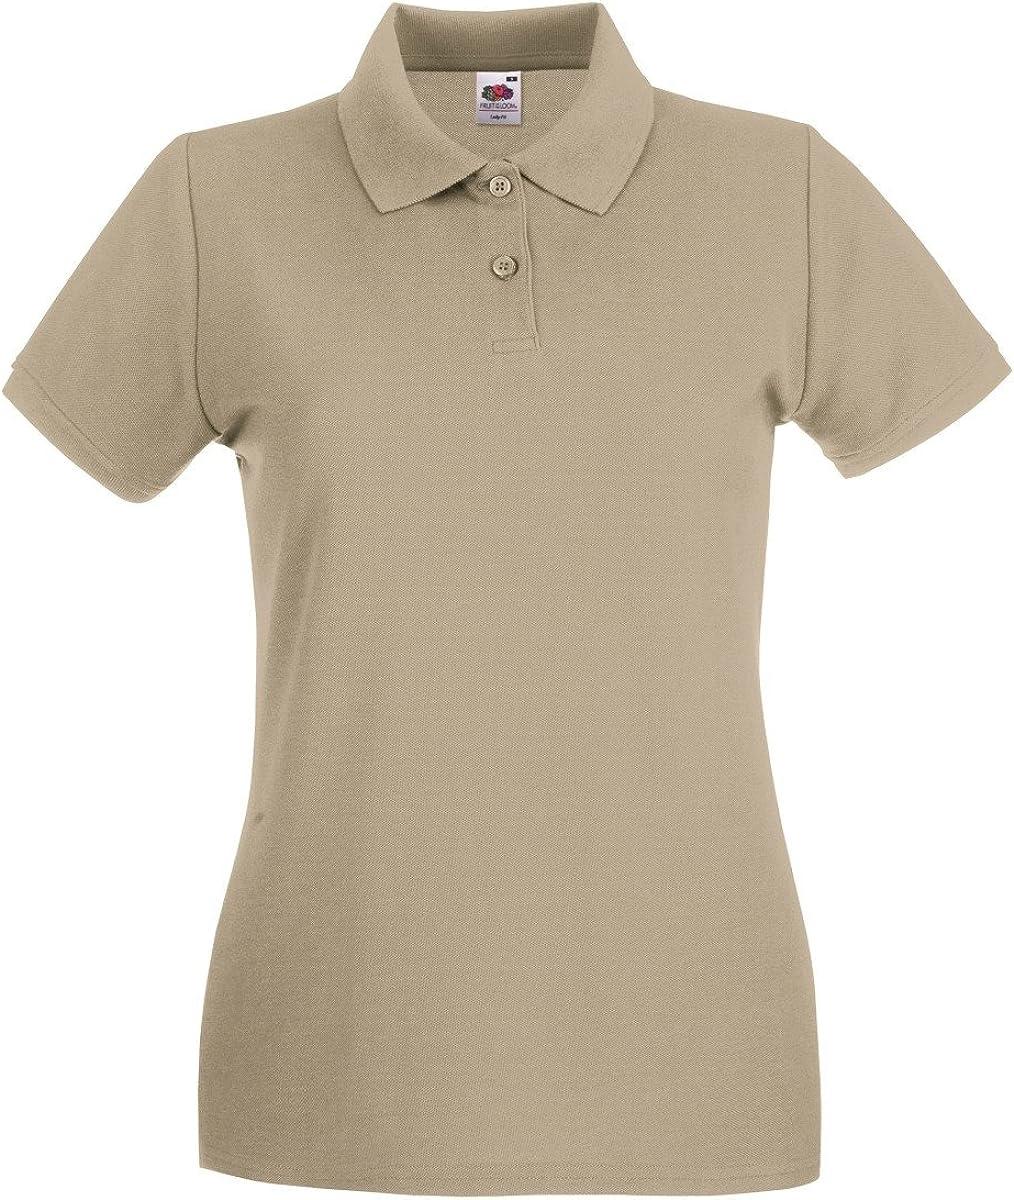 Fruit of the Loom Womens Polo Shirt Short-Sleeve Womens Men Azure Blue Medium